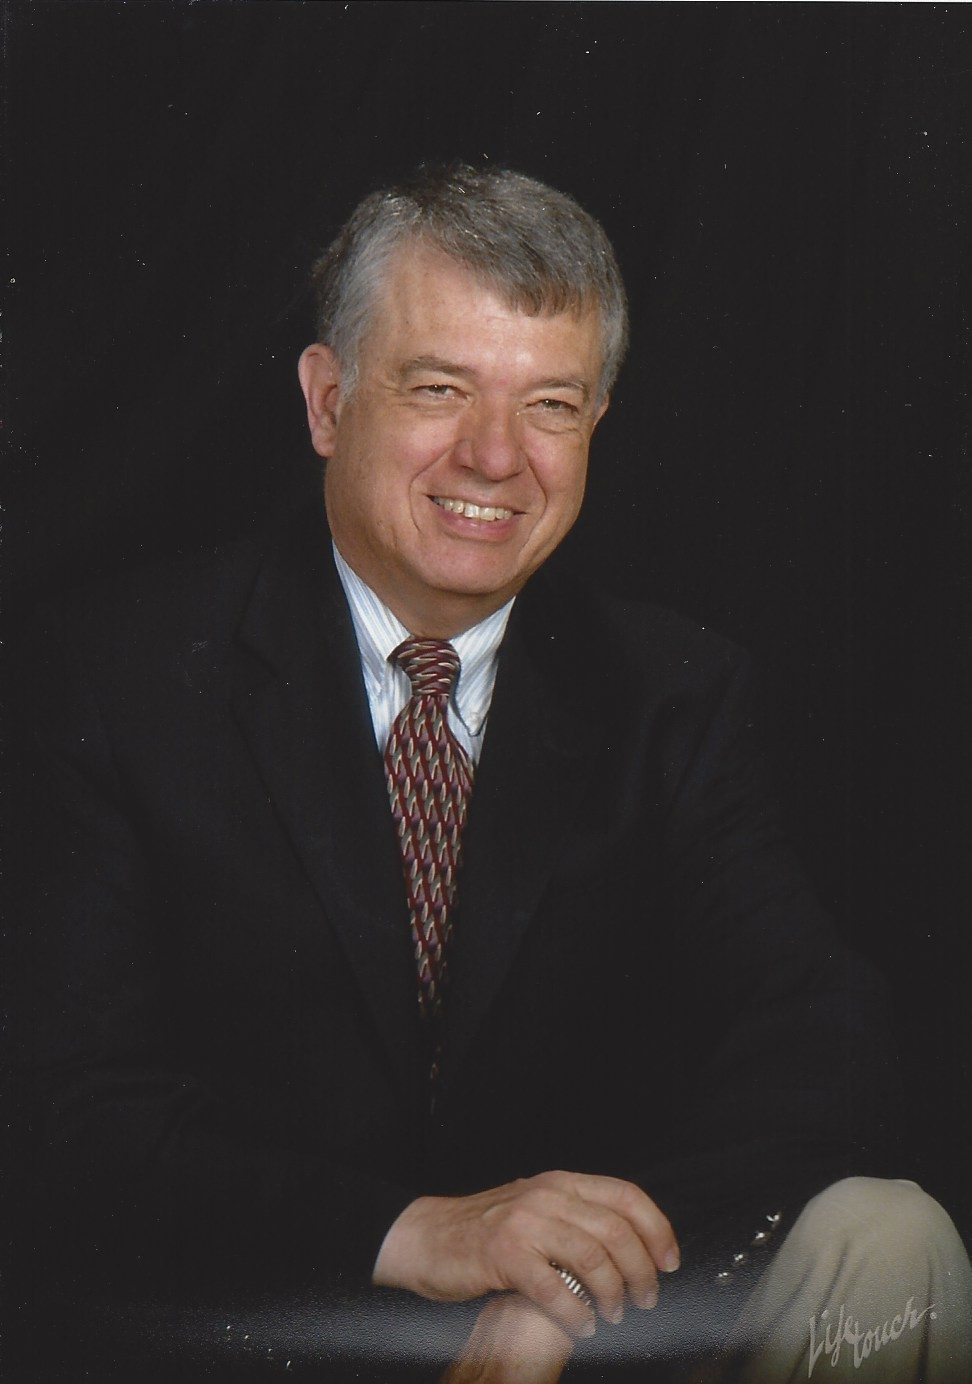 Thomas Vaughn